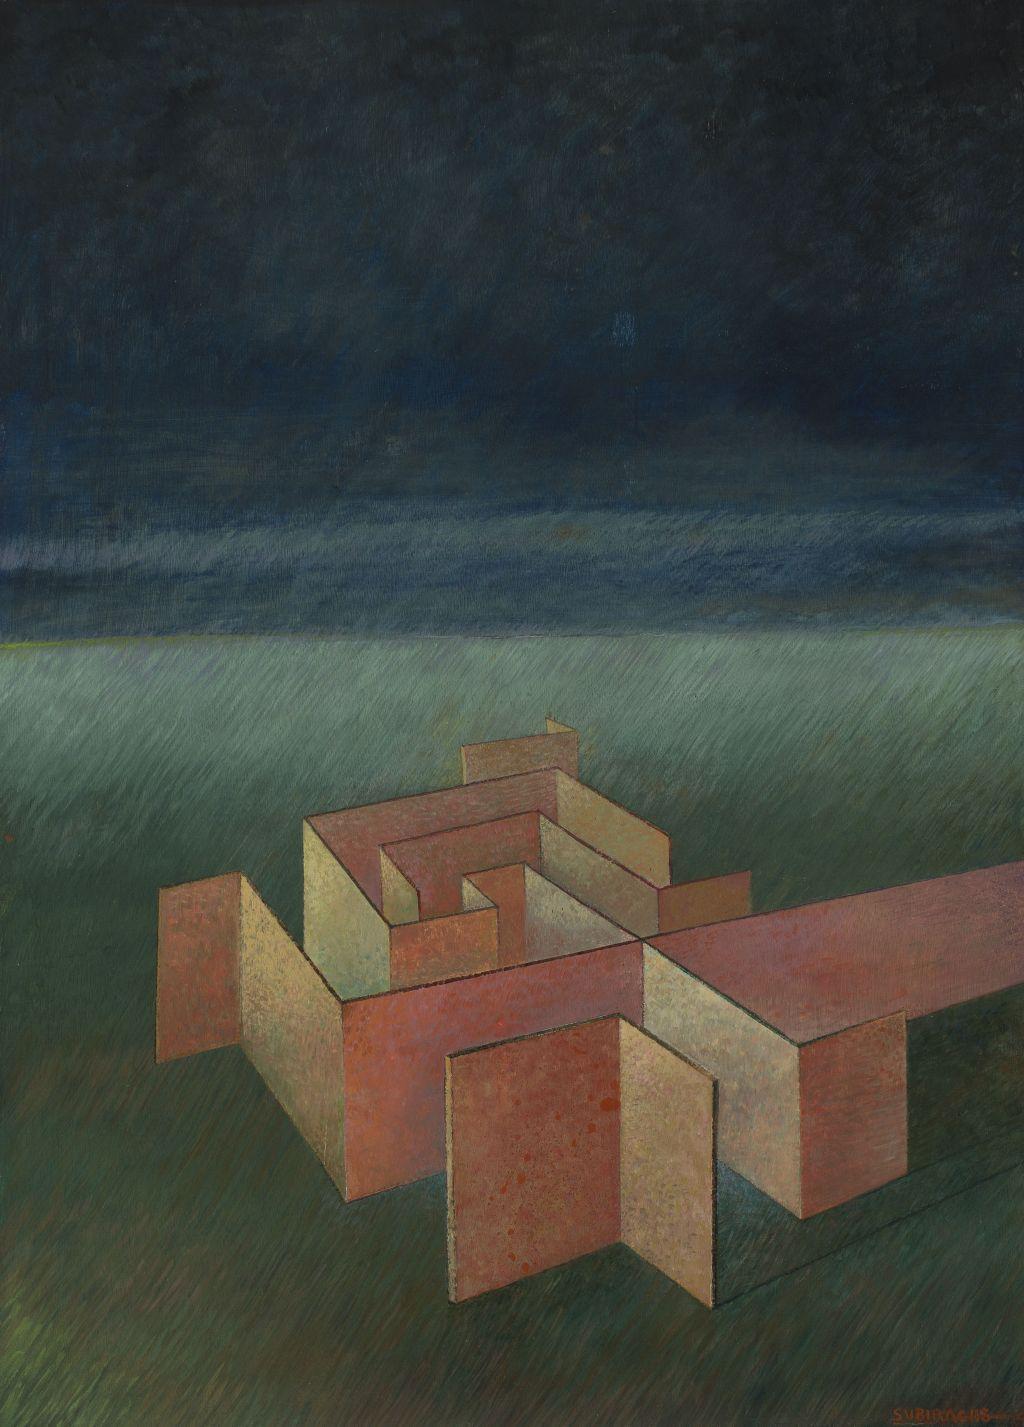 Inicio de laberinto, Josep Maria Subirachs